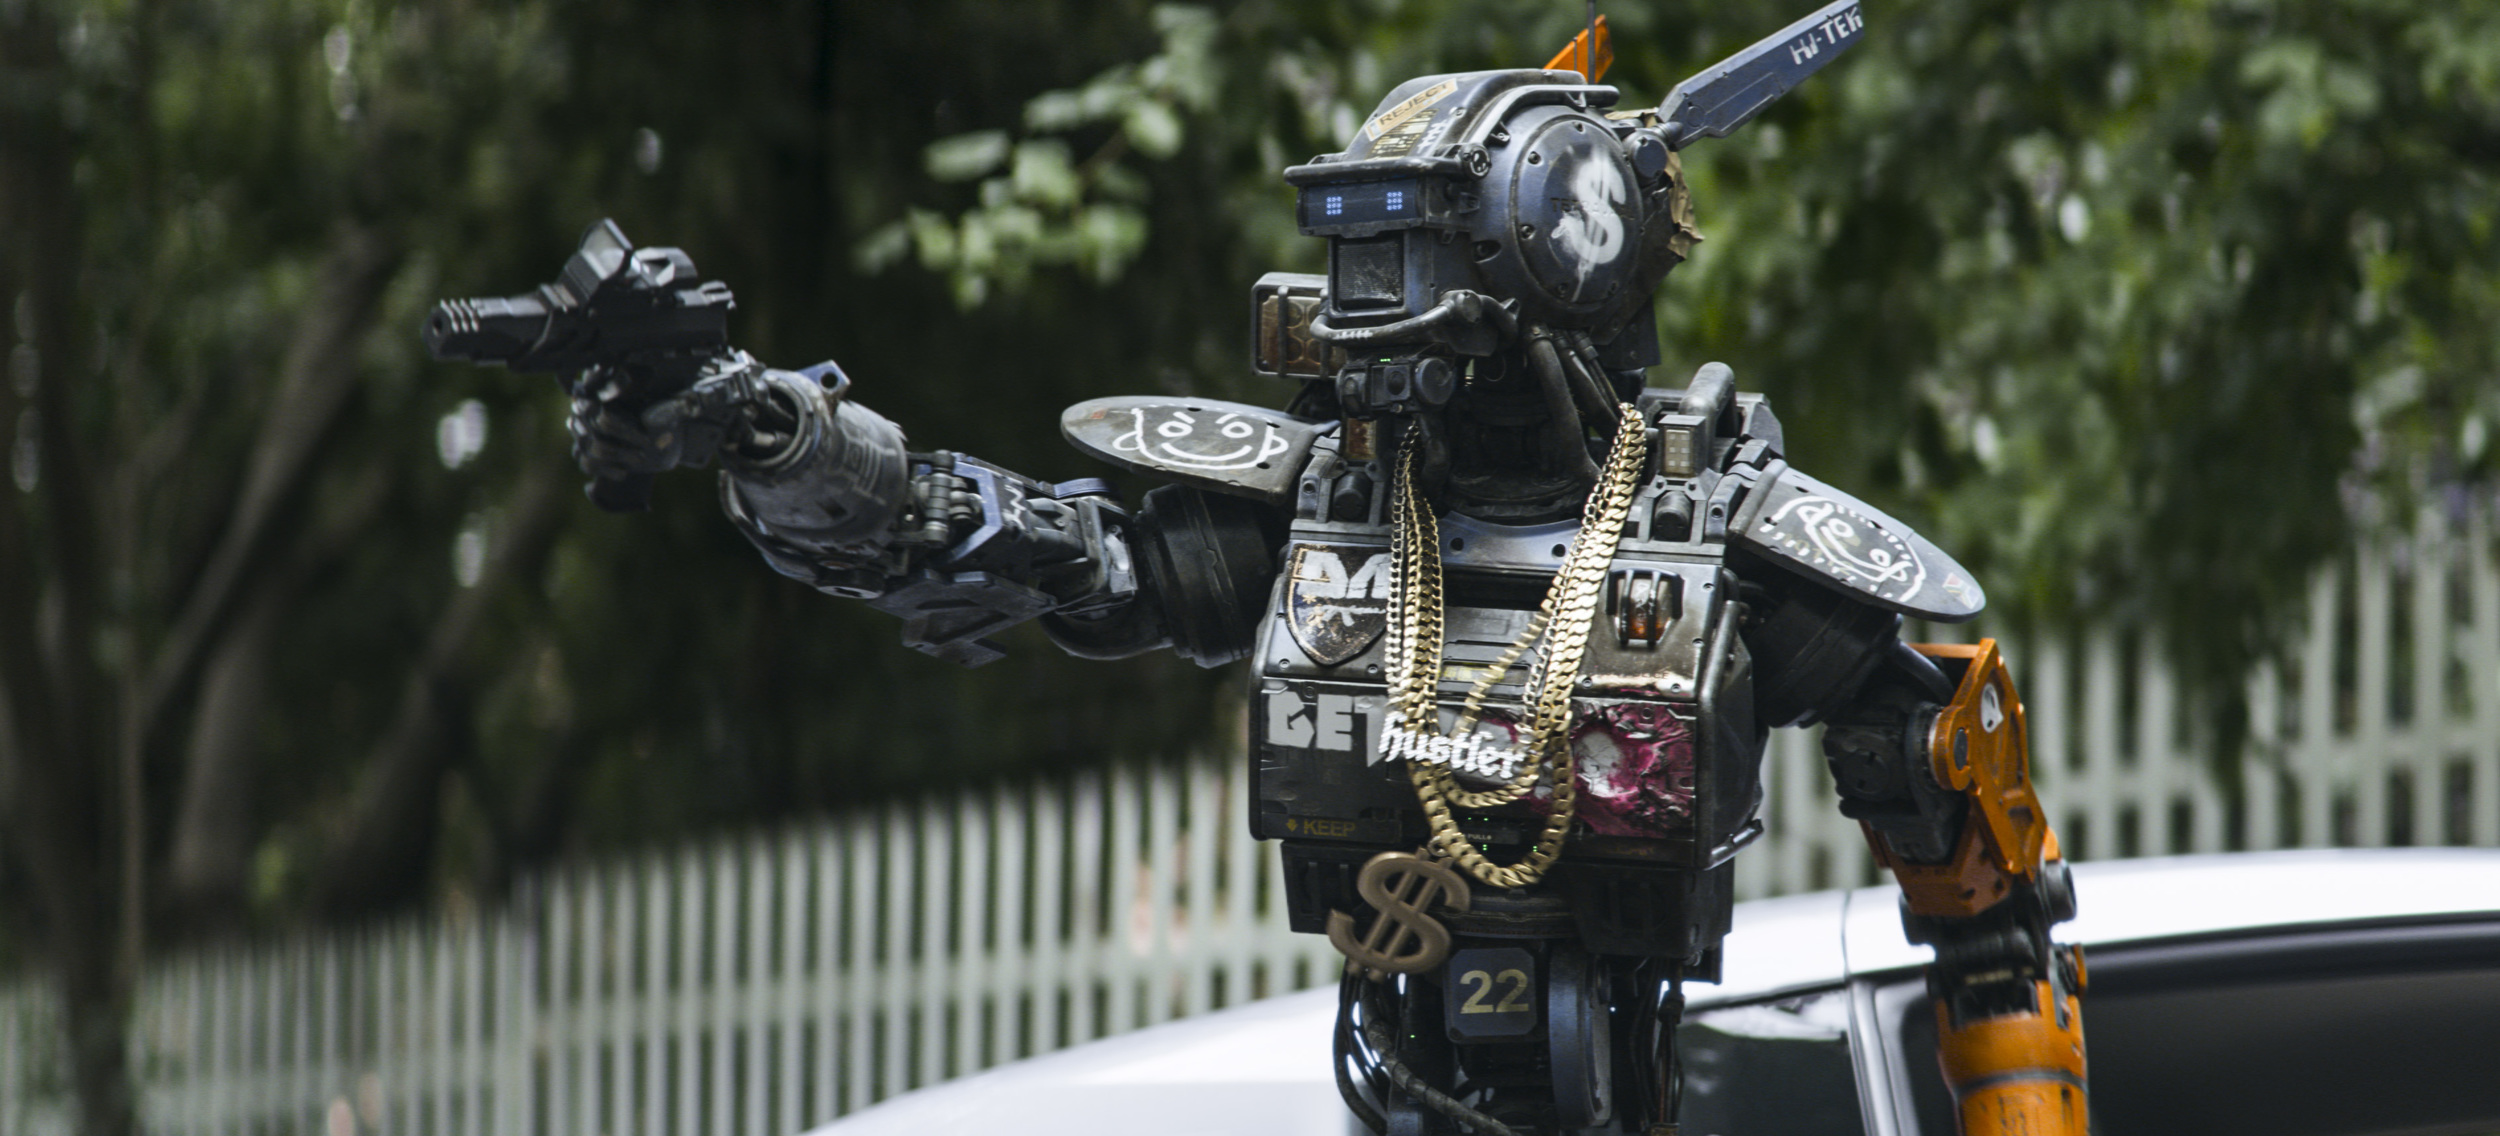 2-tv-spots-for-neill-blomkamps-sci-fi-robot-film-chappie